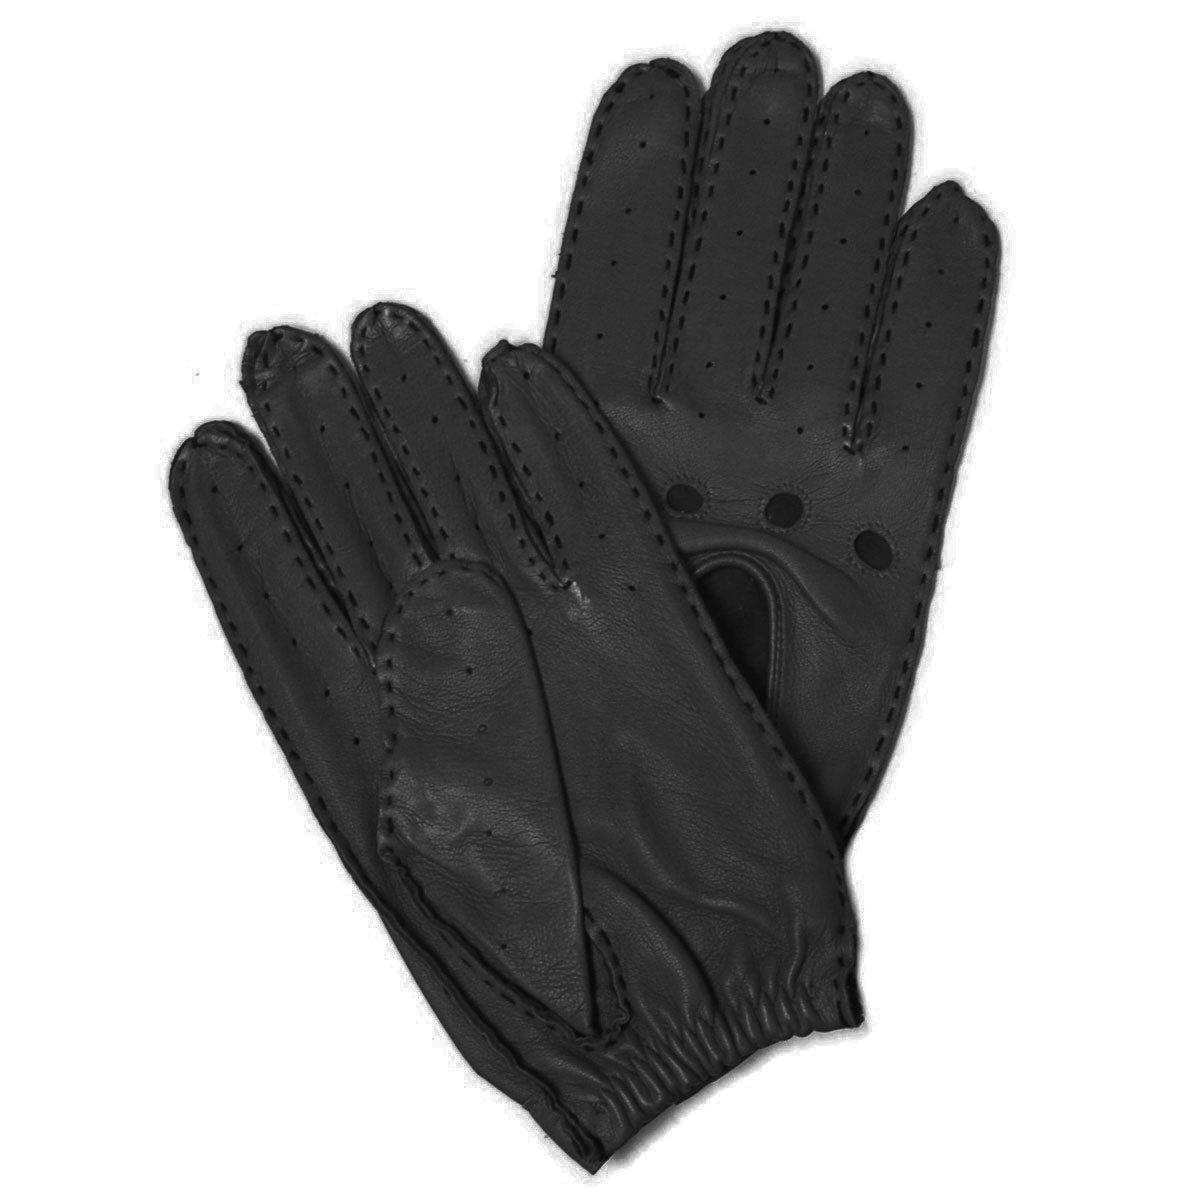 Hilts-Willard Men's Leather Driving Gloves - M - Black